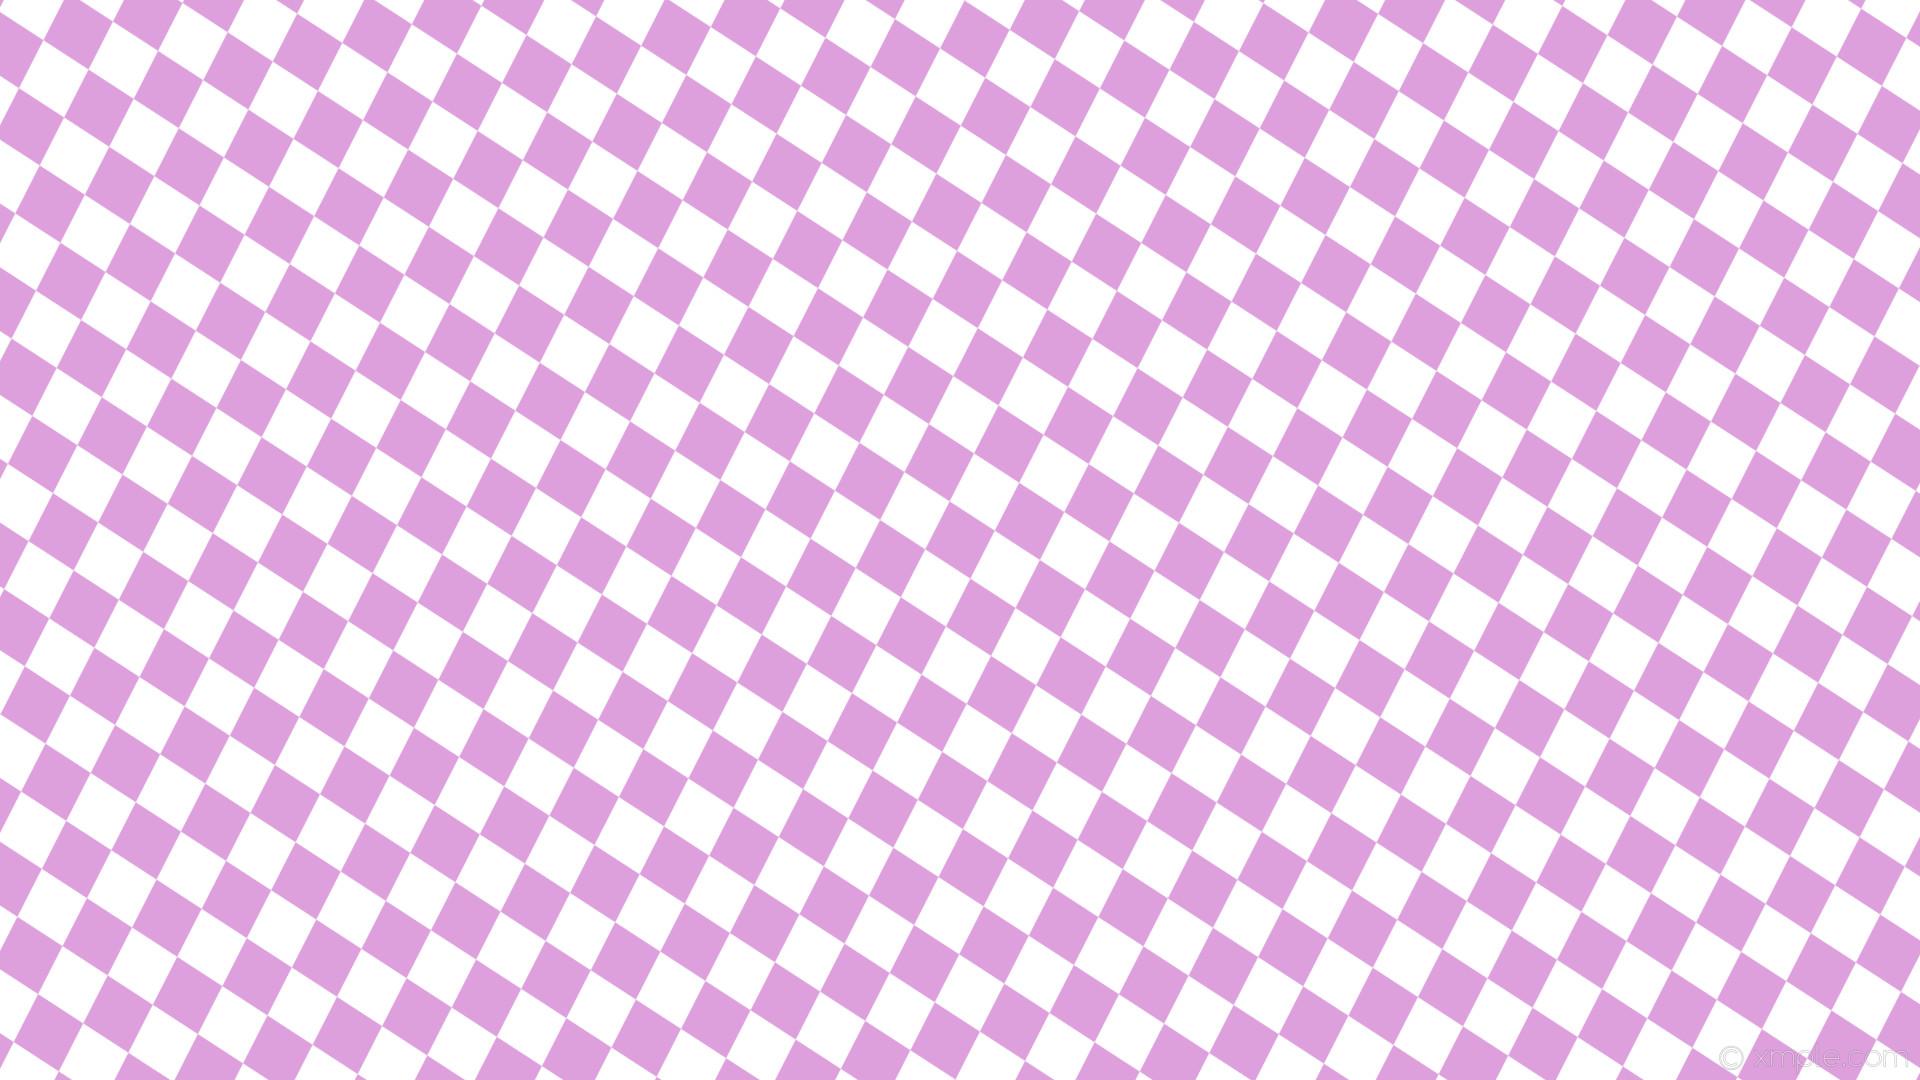 wallpaper white rhombus lozenge purple diamond plum #dda0dd #ffffff 105°  80px 72px